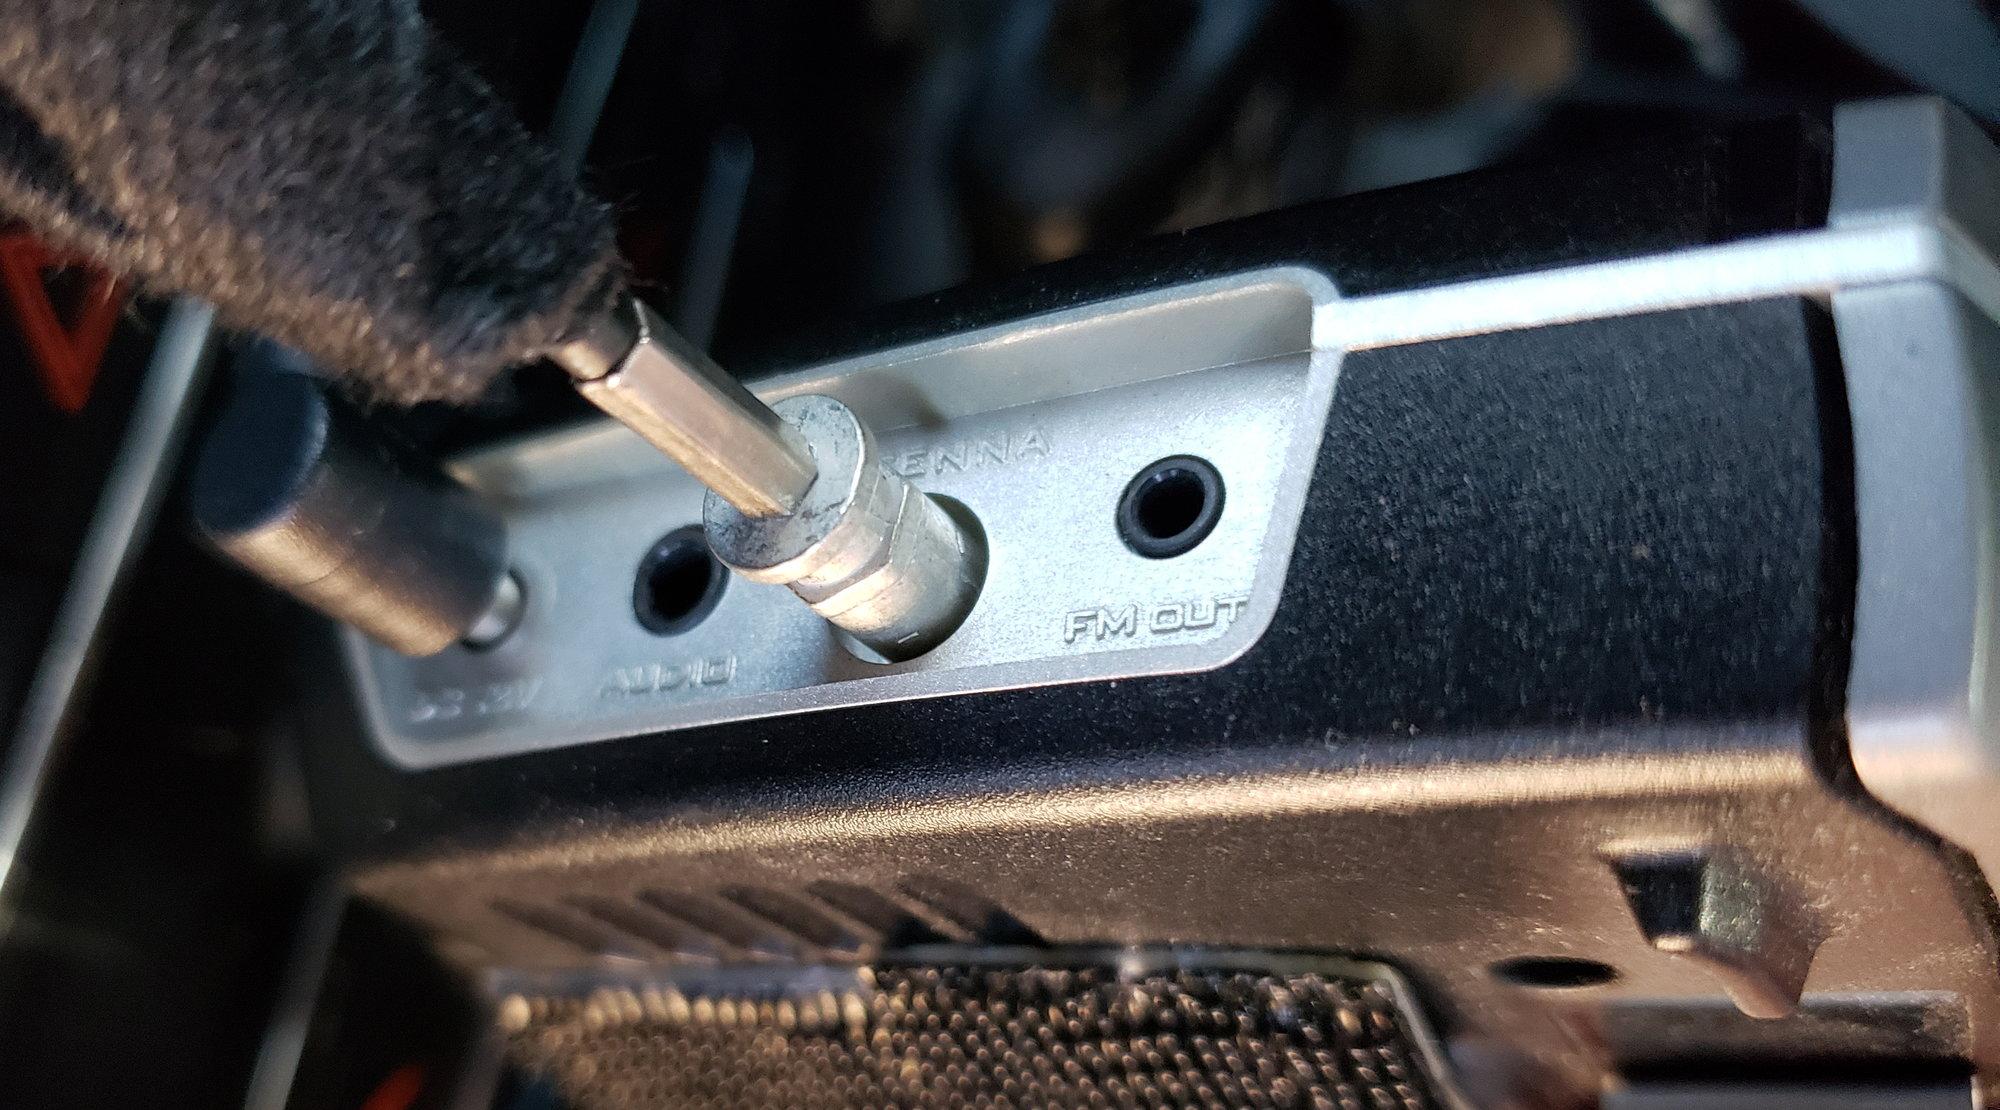 2015 Dodge Charger Pursuit Siriusxm Satellite Radio Plug